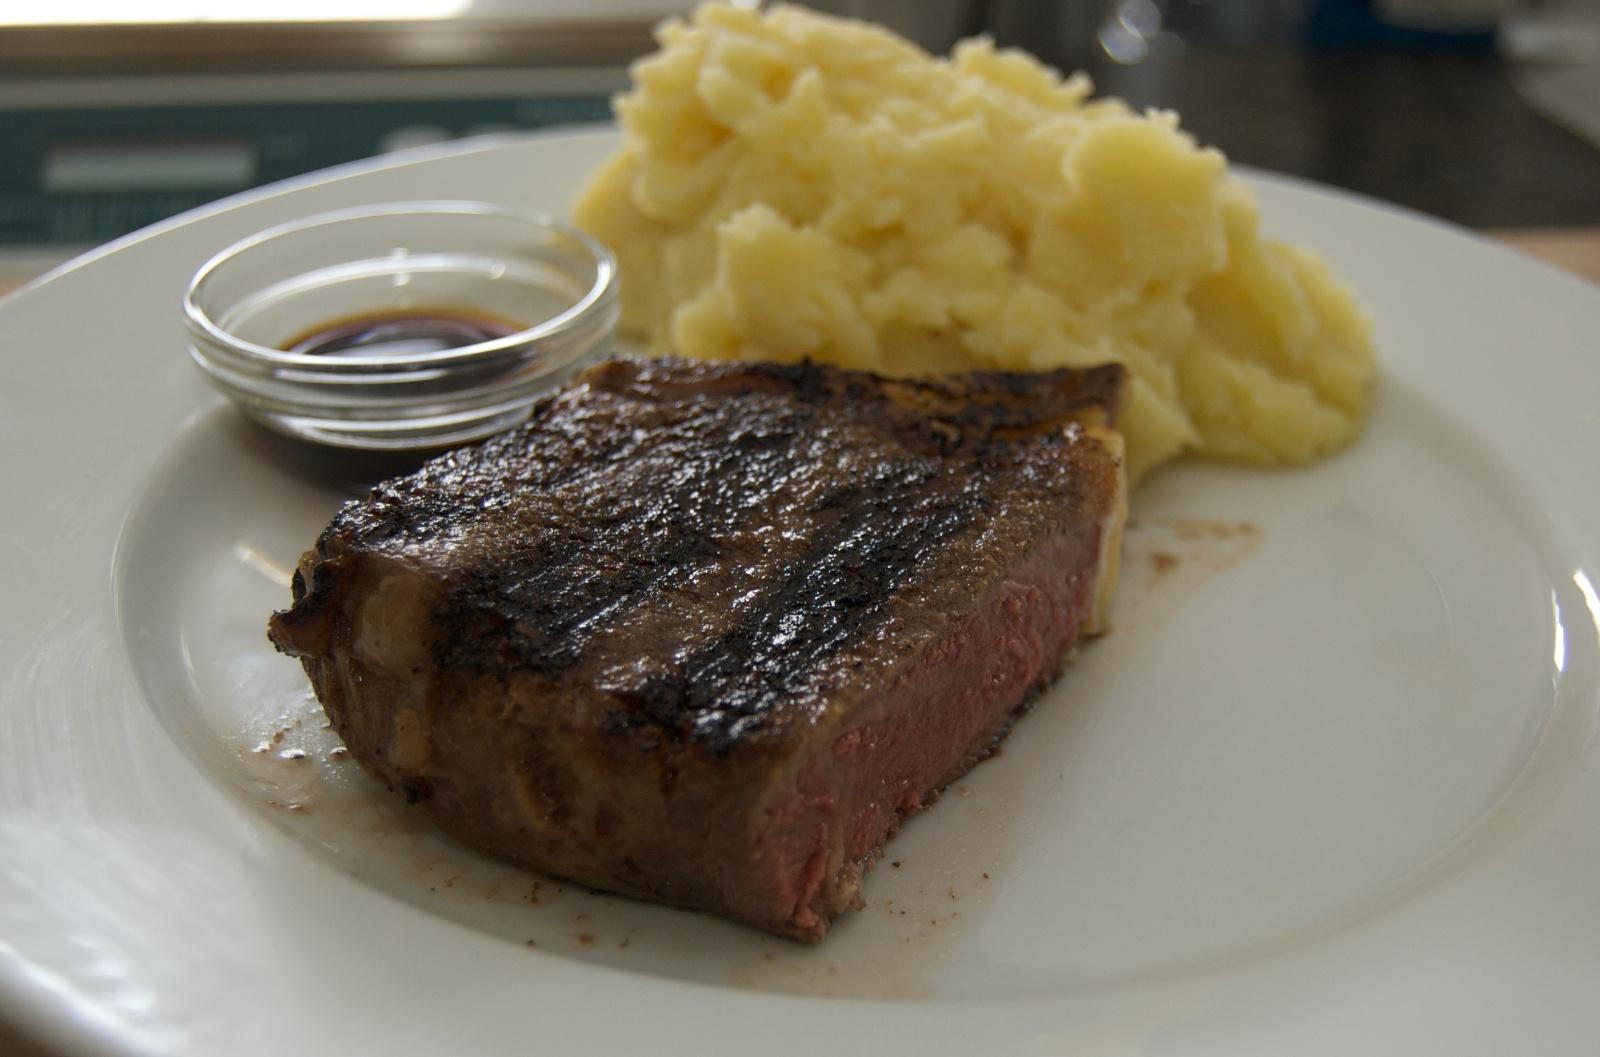 http://blog.rickk.com/food/2010/05/22/delmonico.jpg